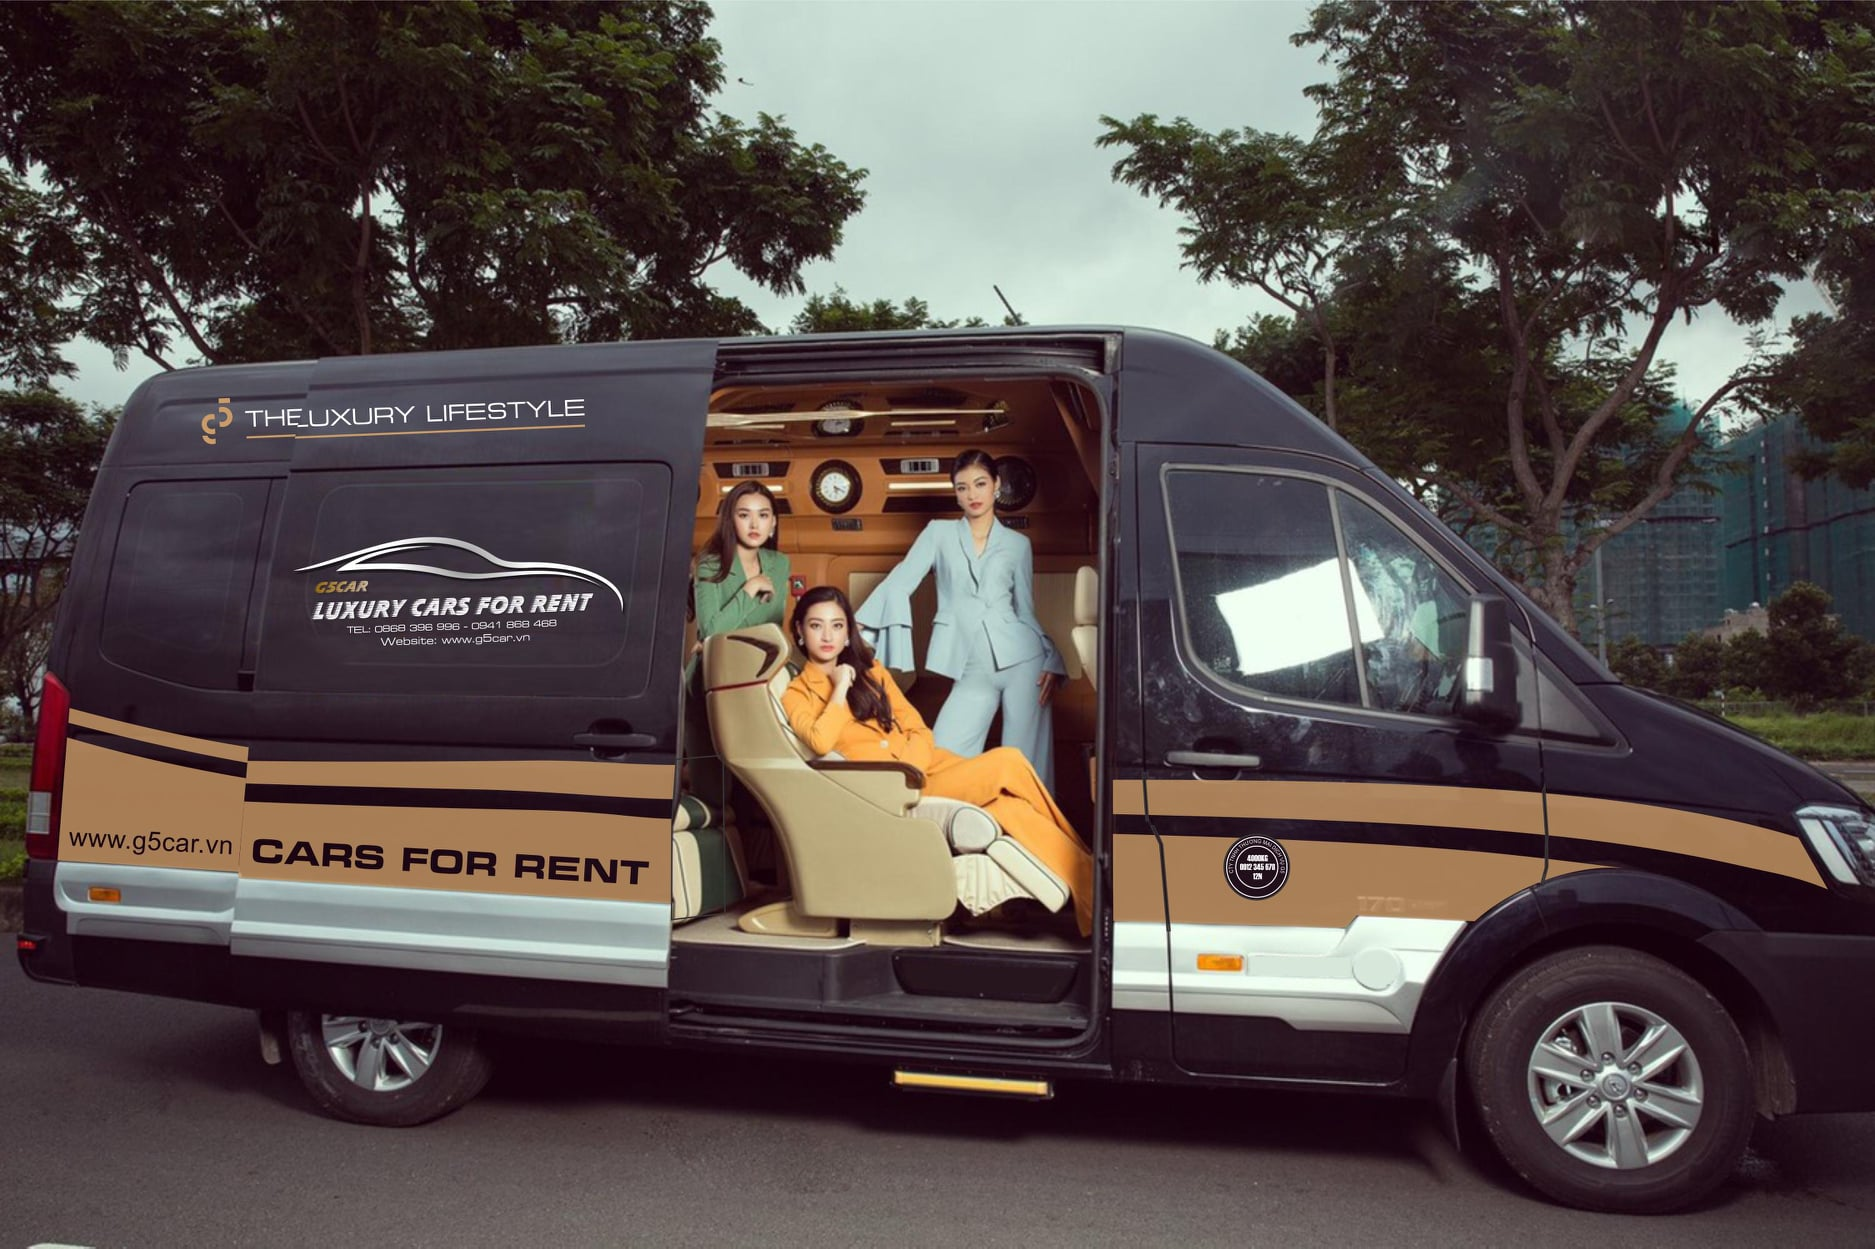 Thuê xe 12 chỗ Limousine - My Tam Travel